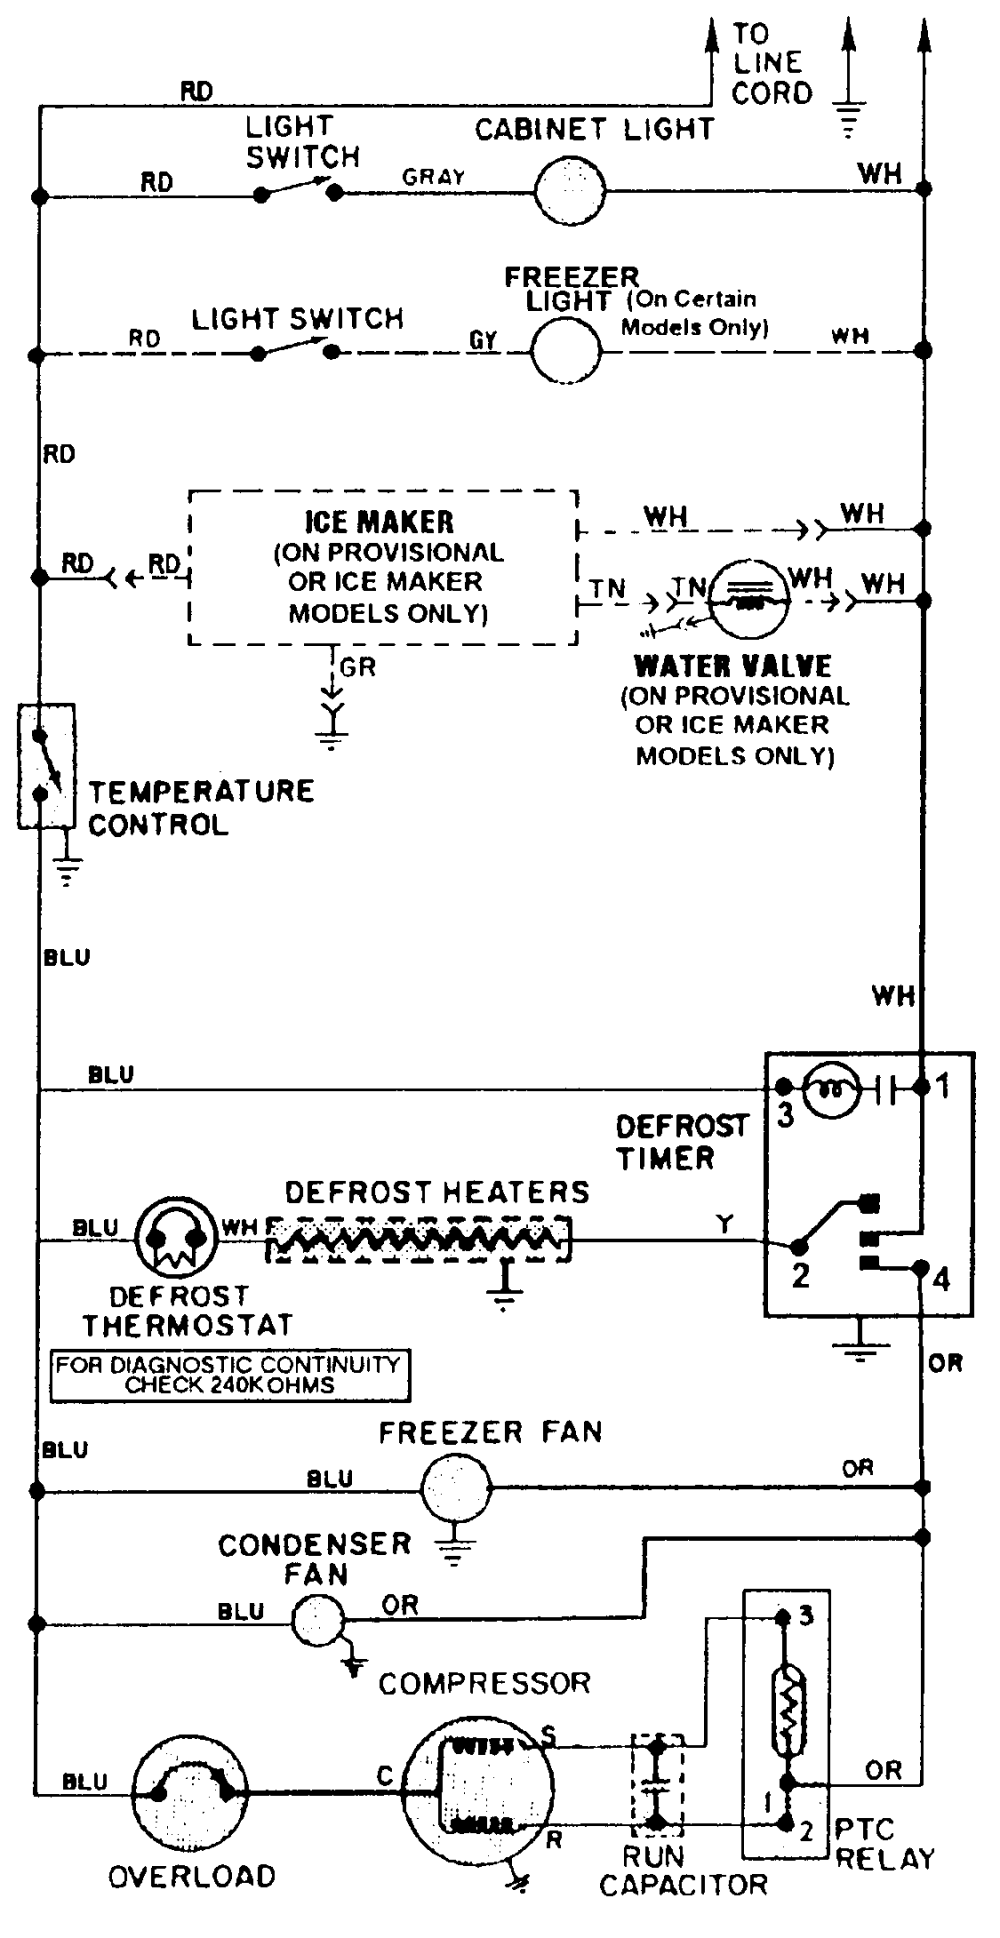 medium resolution of magic chef defrost timer wiring diagram